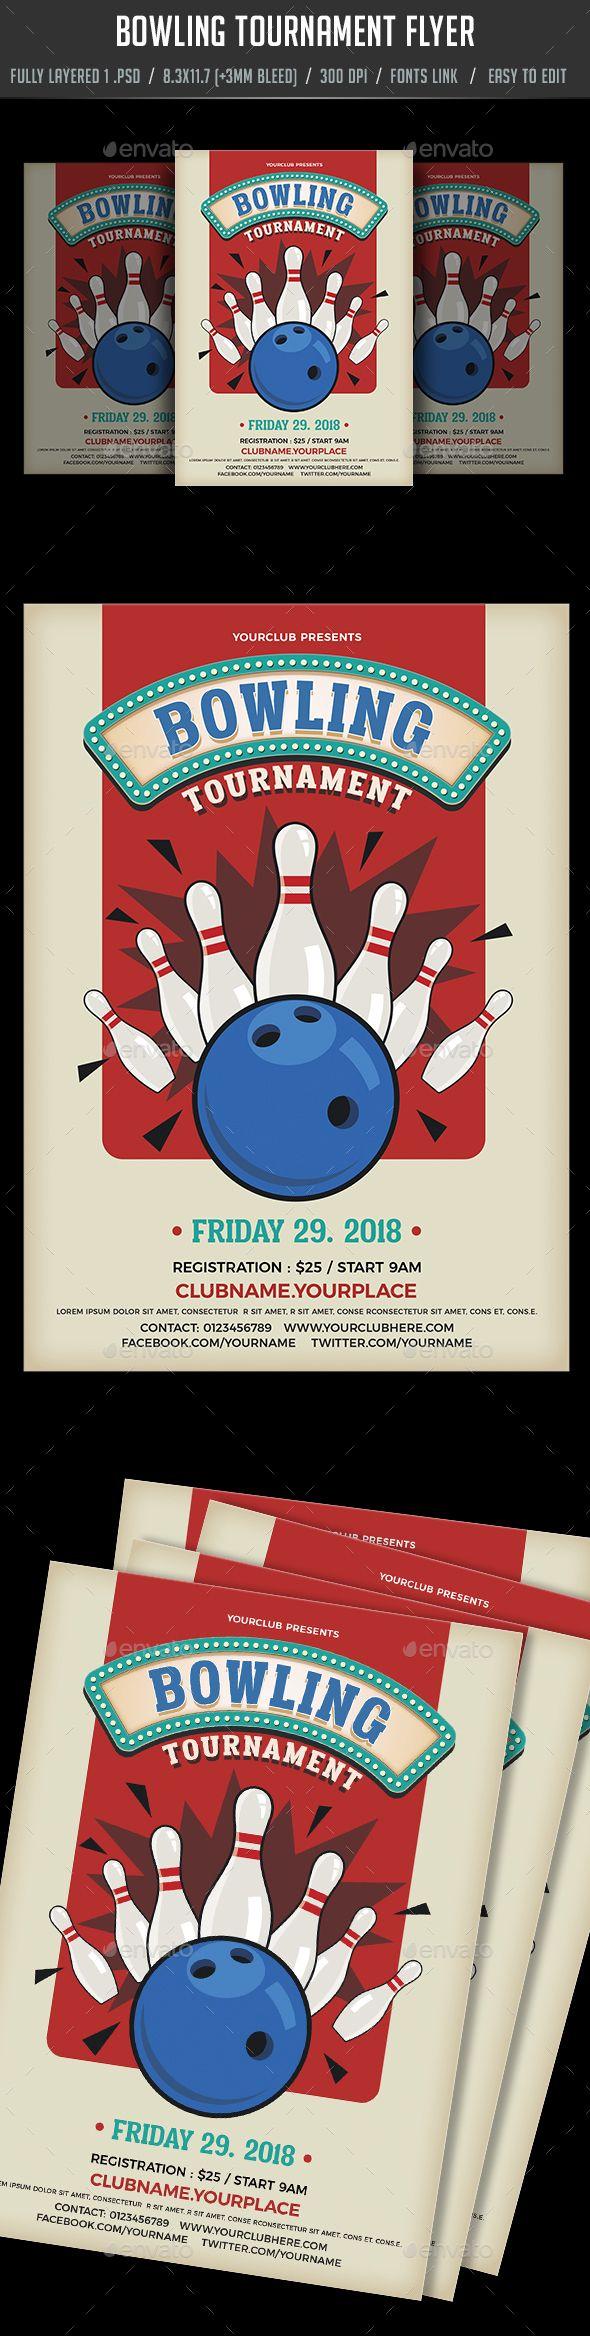 Bowling Tournament Flyer Bowling tournament, Bowling, Flyer